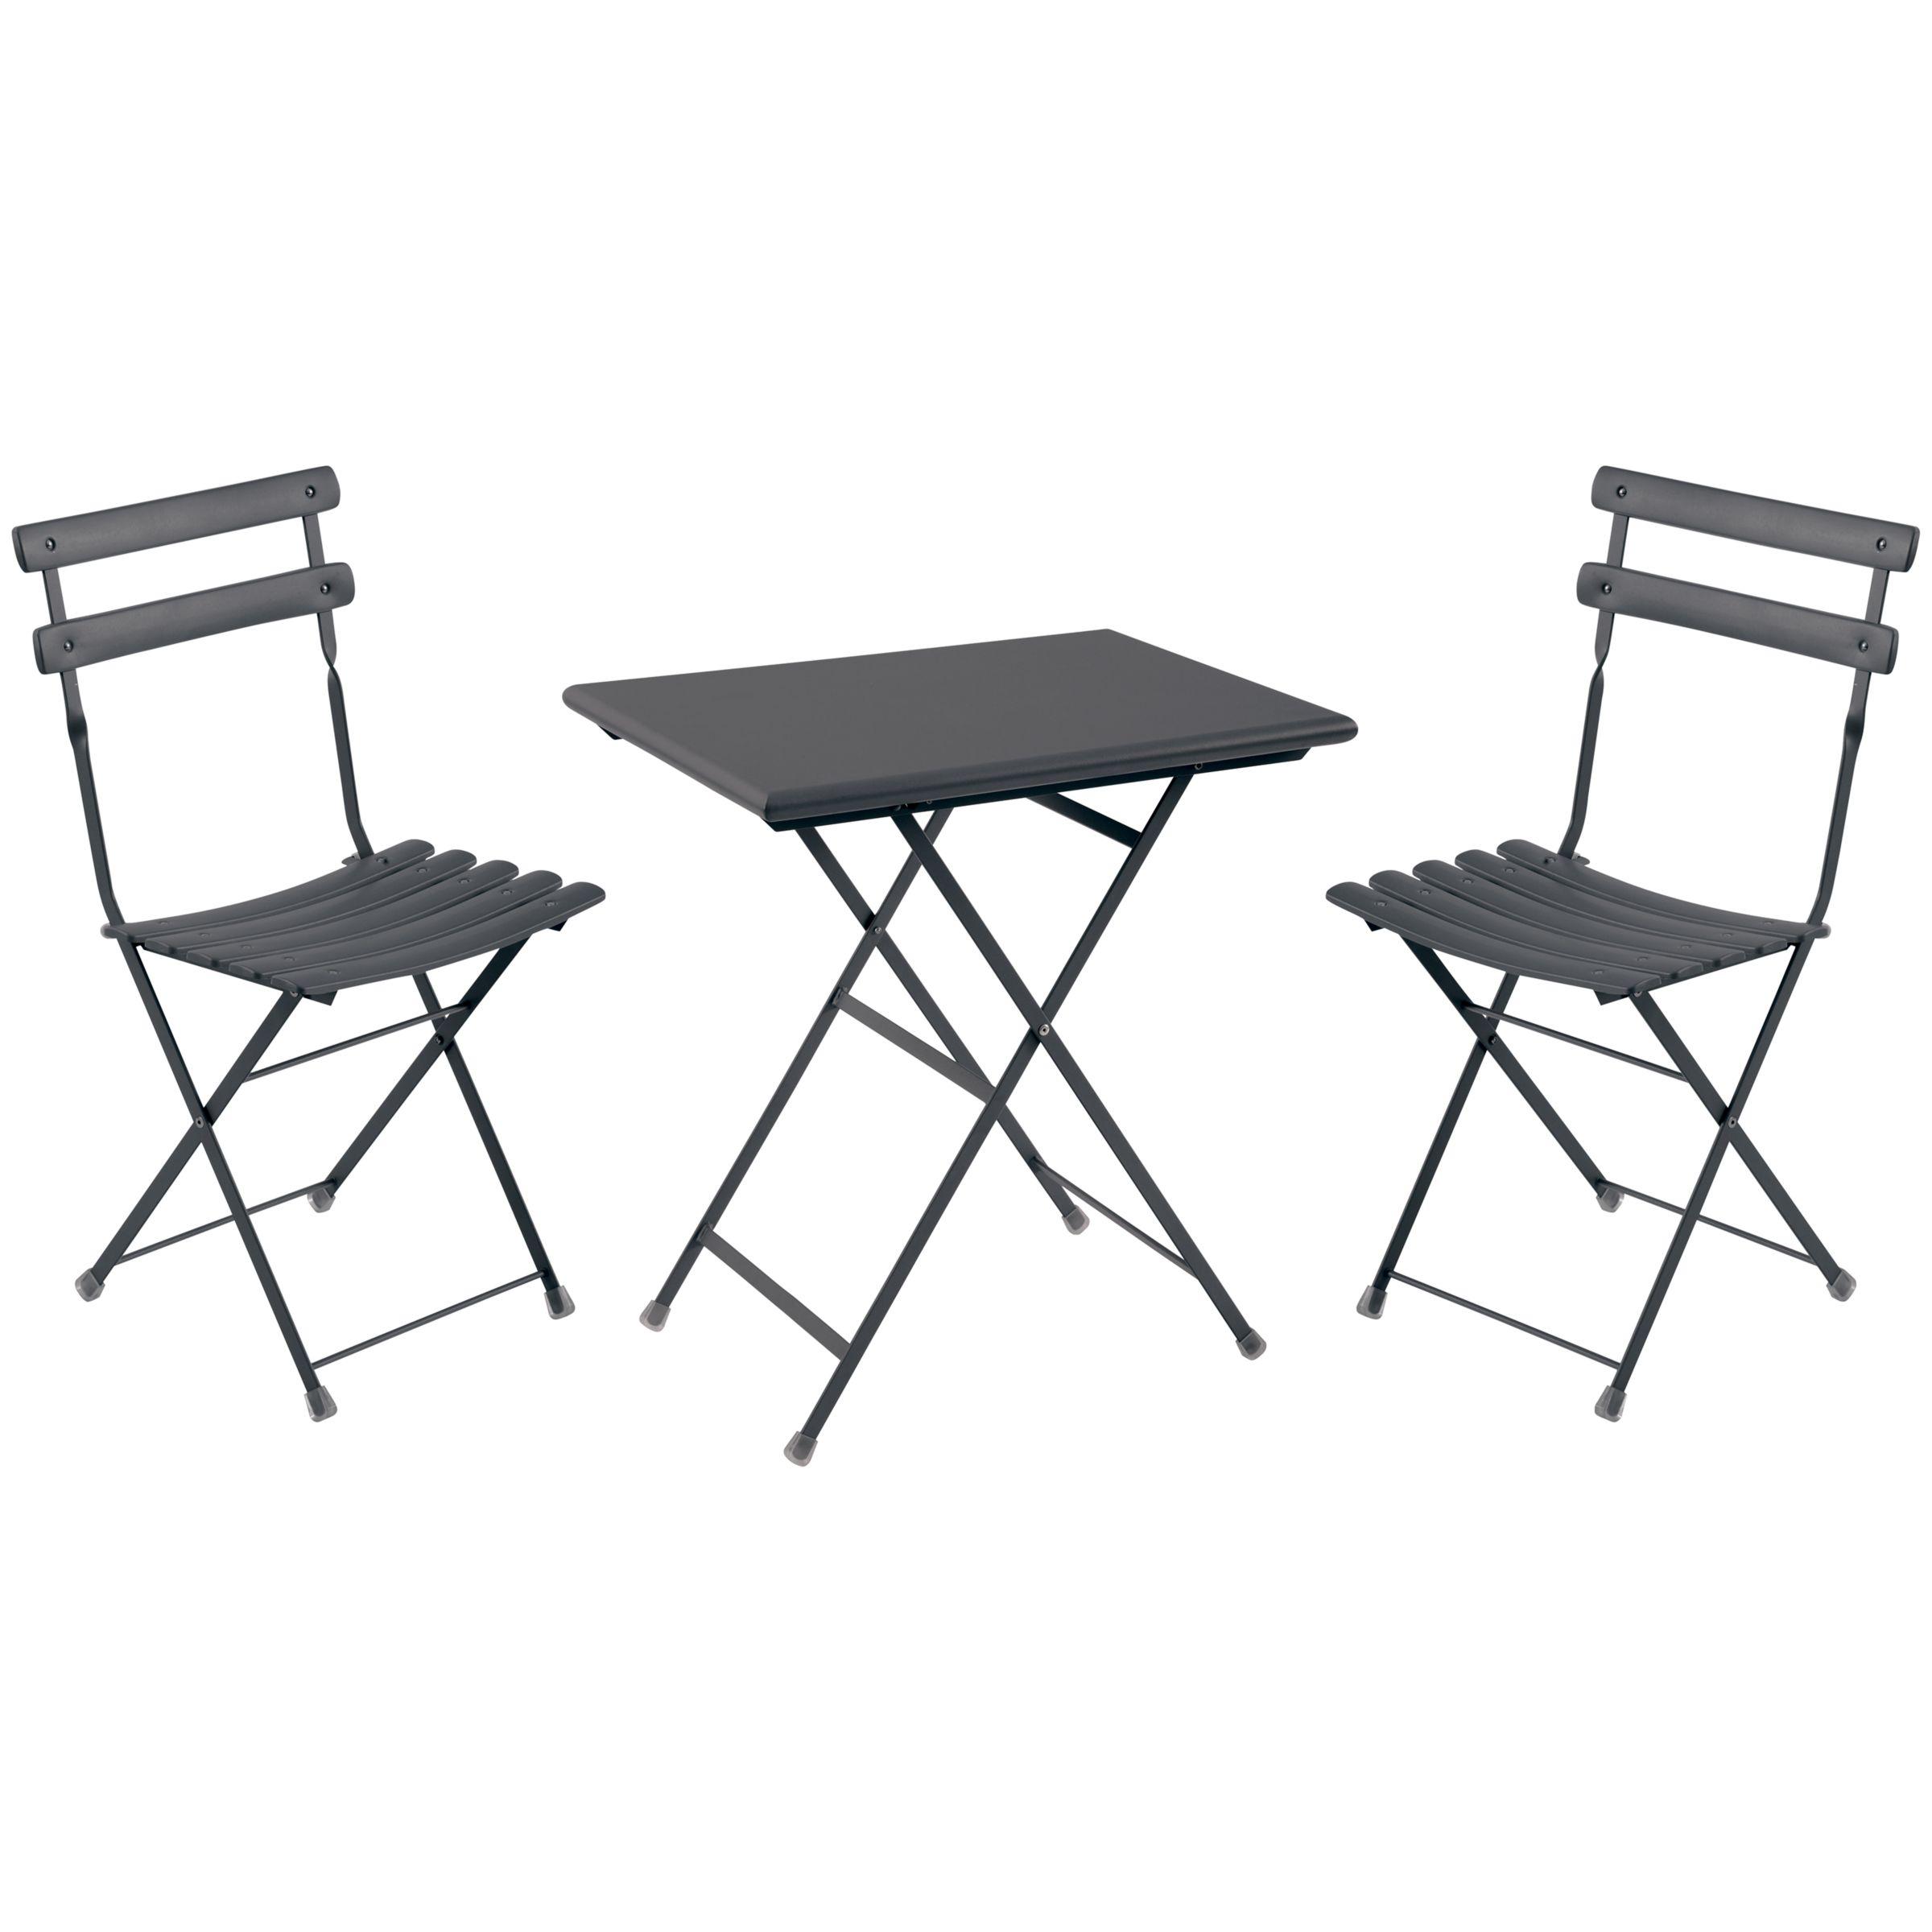 EMU Arc en Ciel 2 Seater Square Outdoor Furniture Set, Iron